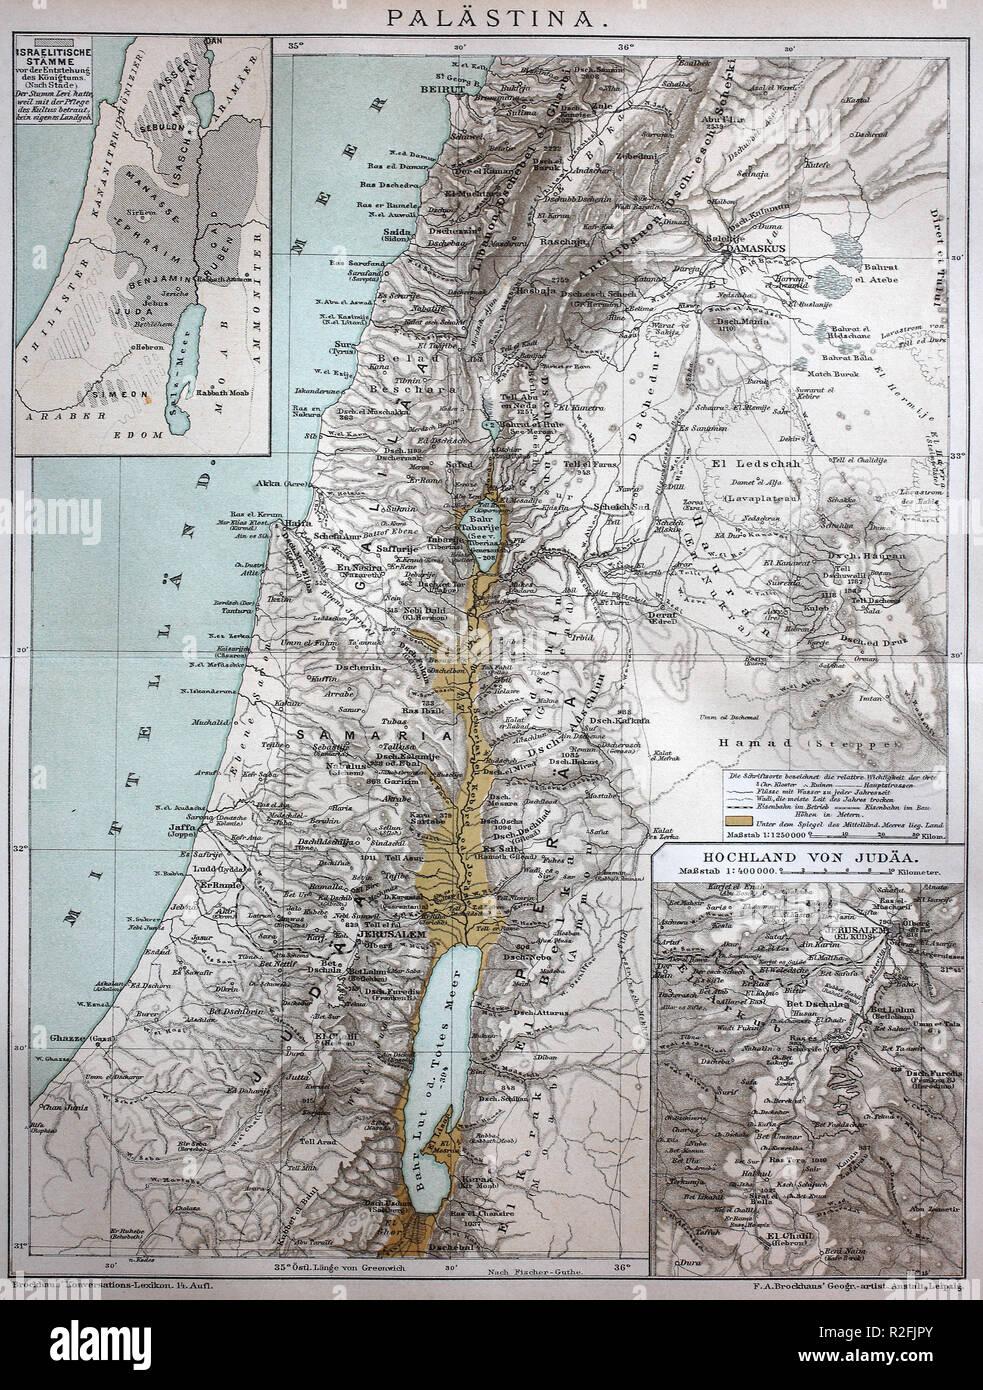 fcf6caf469dbd0 Palestine Map Stock Photos   Palestine Map Stock Images - Alamy